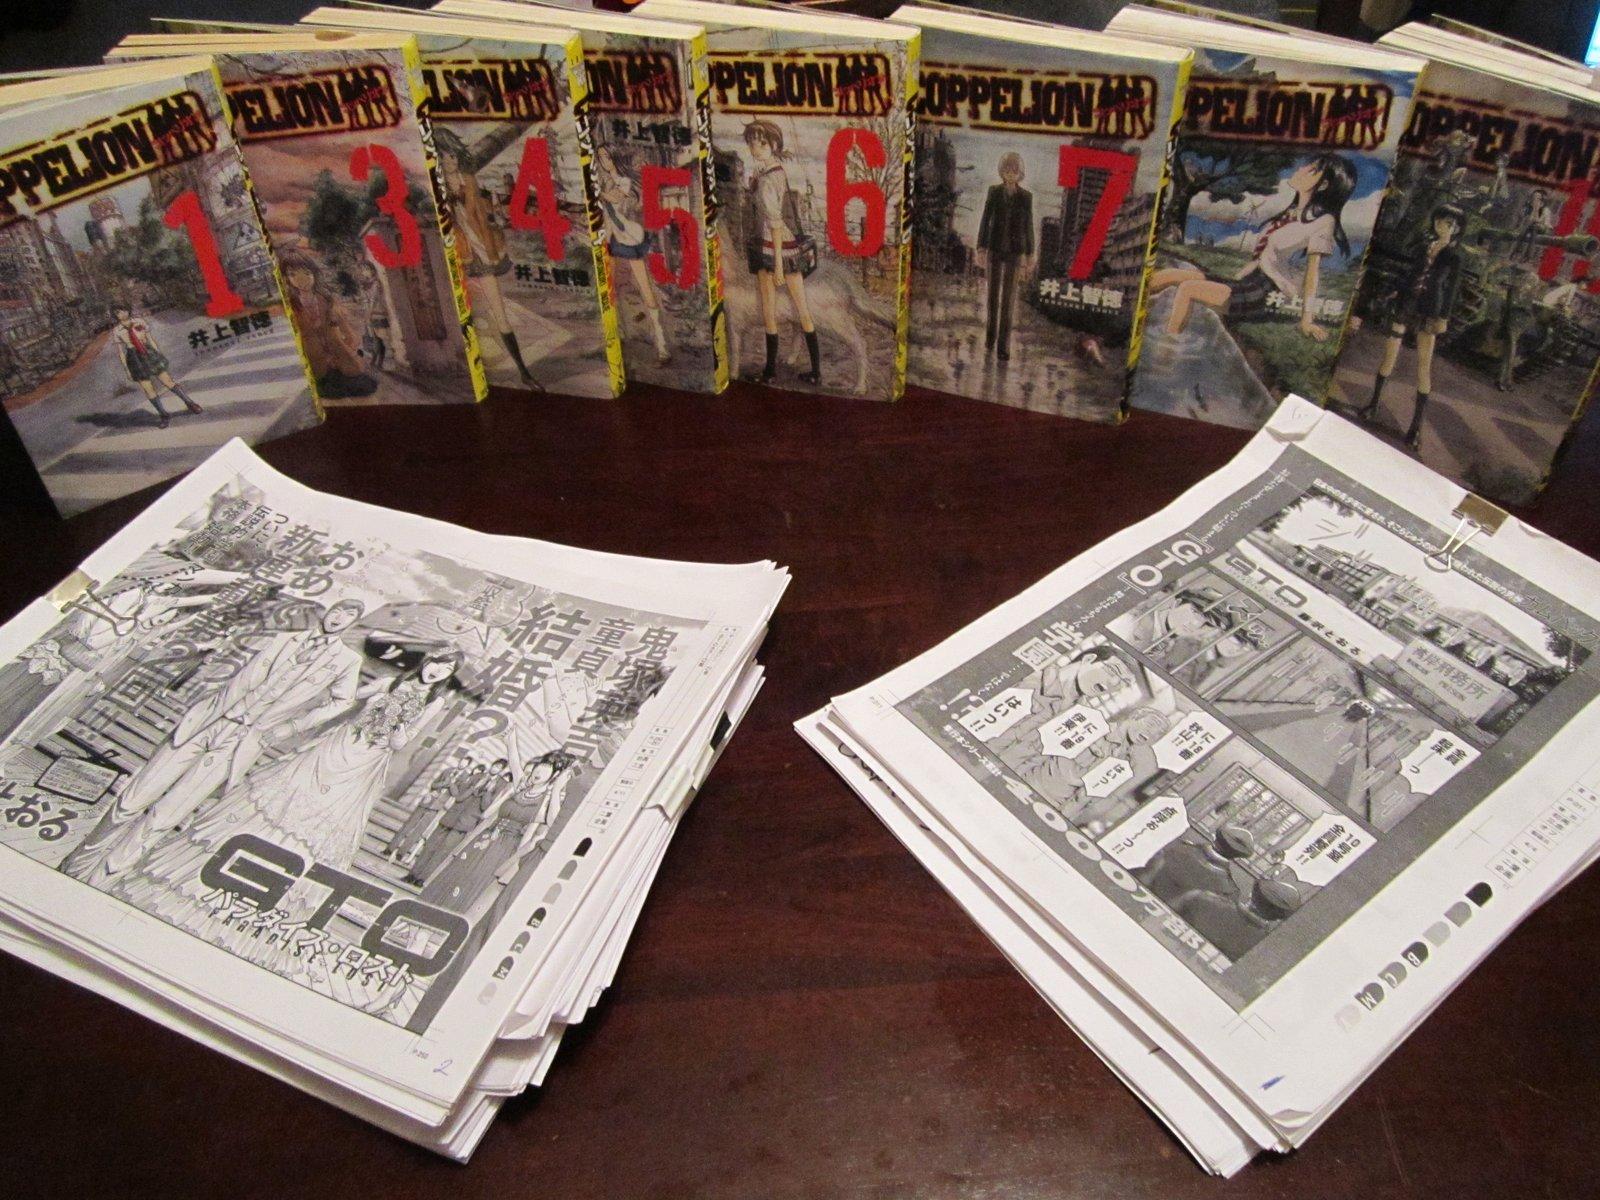 Become a manga translator an interview with a manga translation battle winner part 3